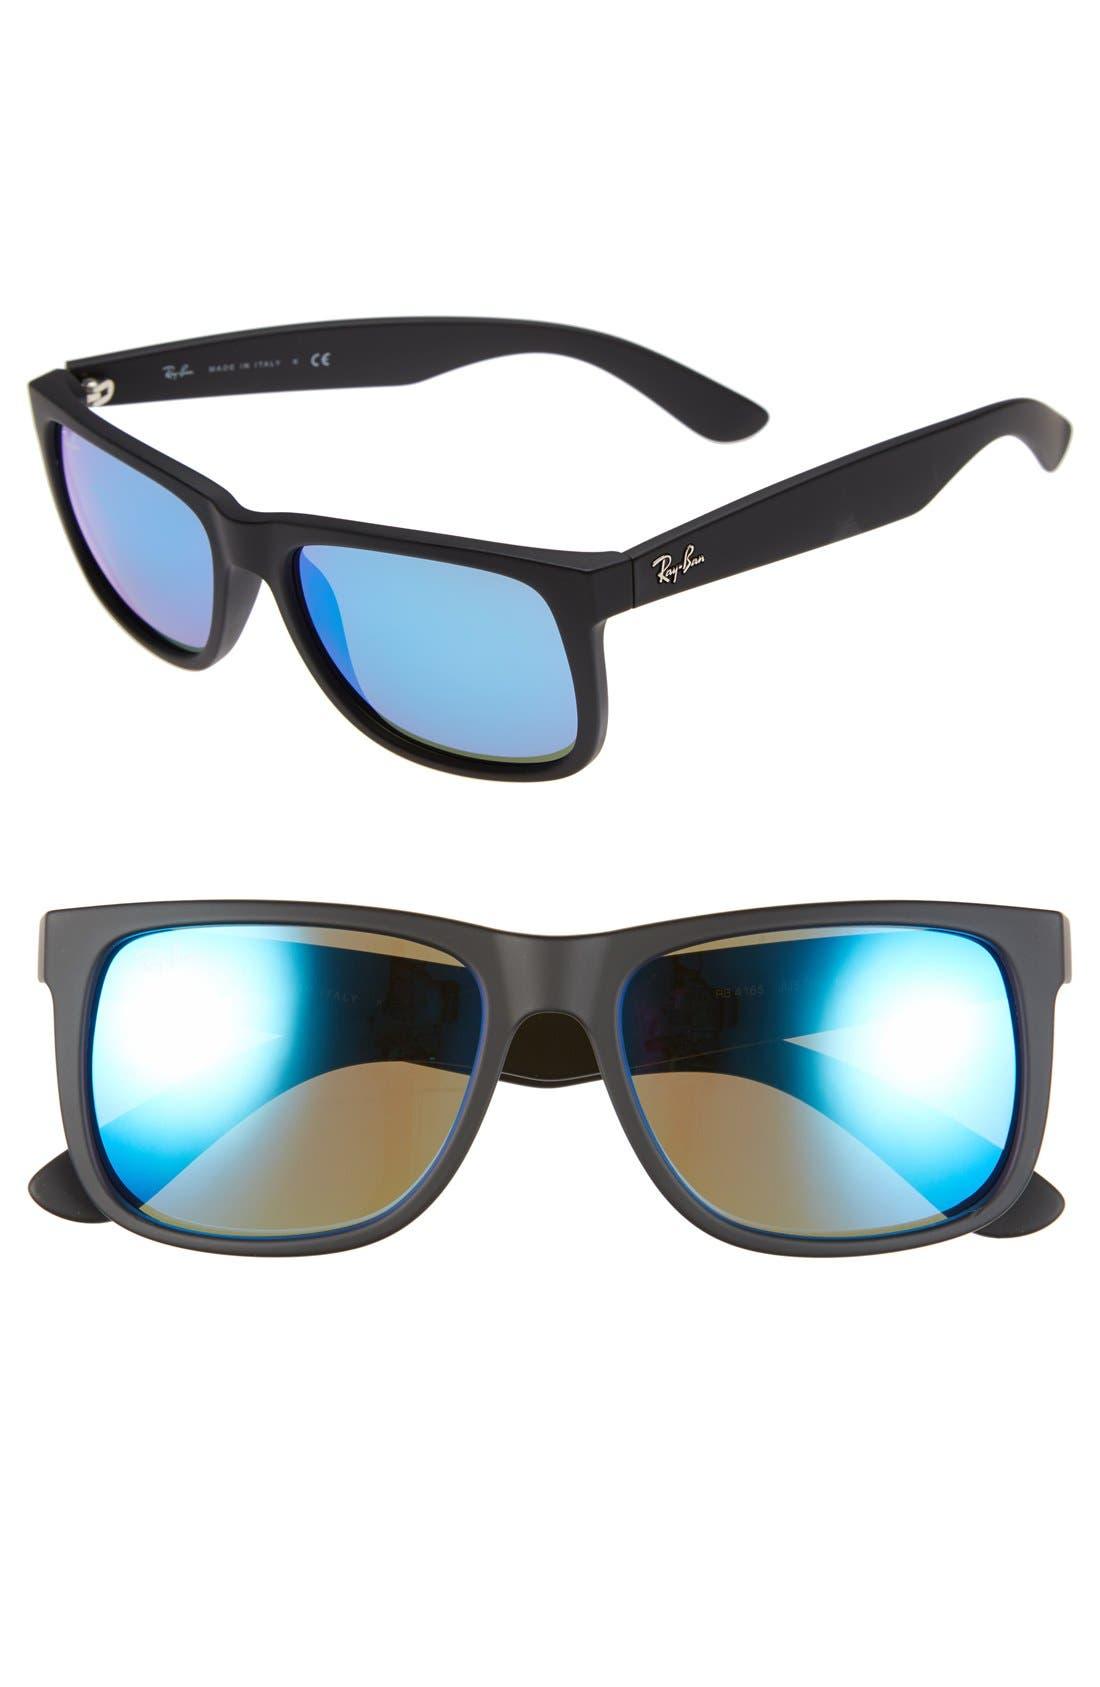 Ray-Ban 5m Sunglasses - Black/ Green Mirror Blue